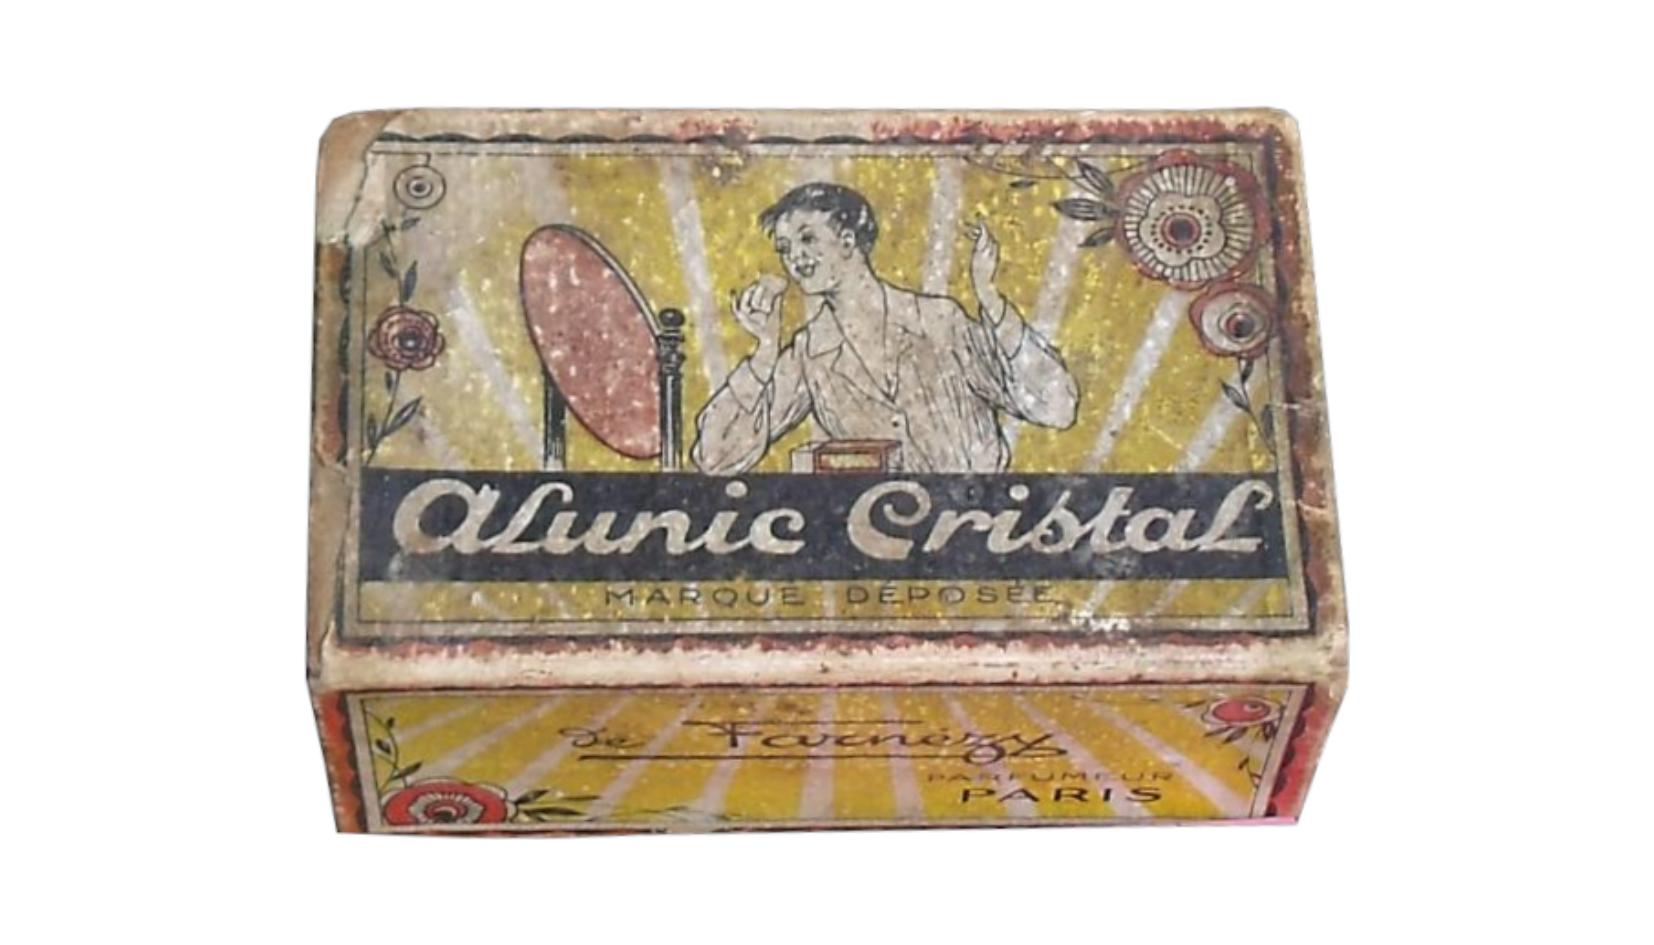 Alunic Cristal